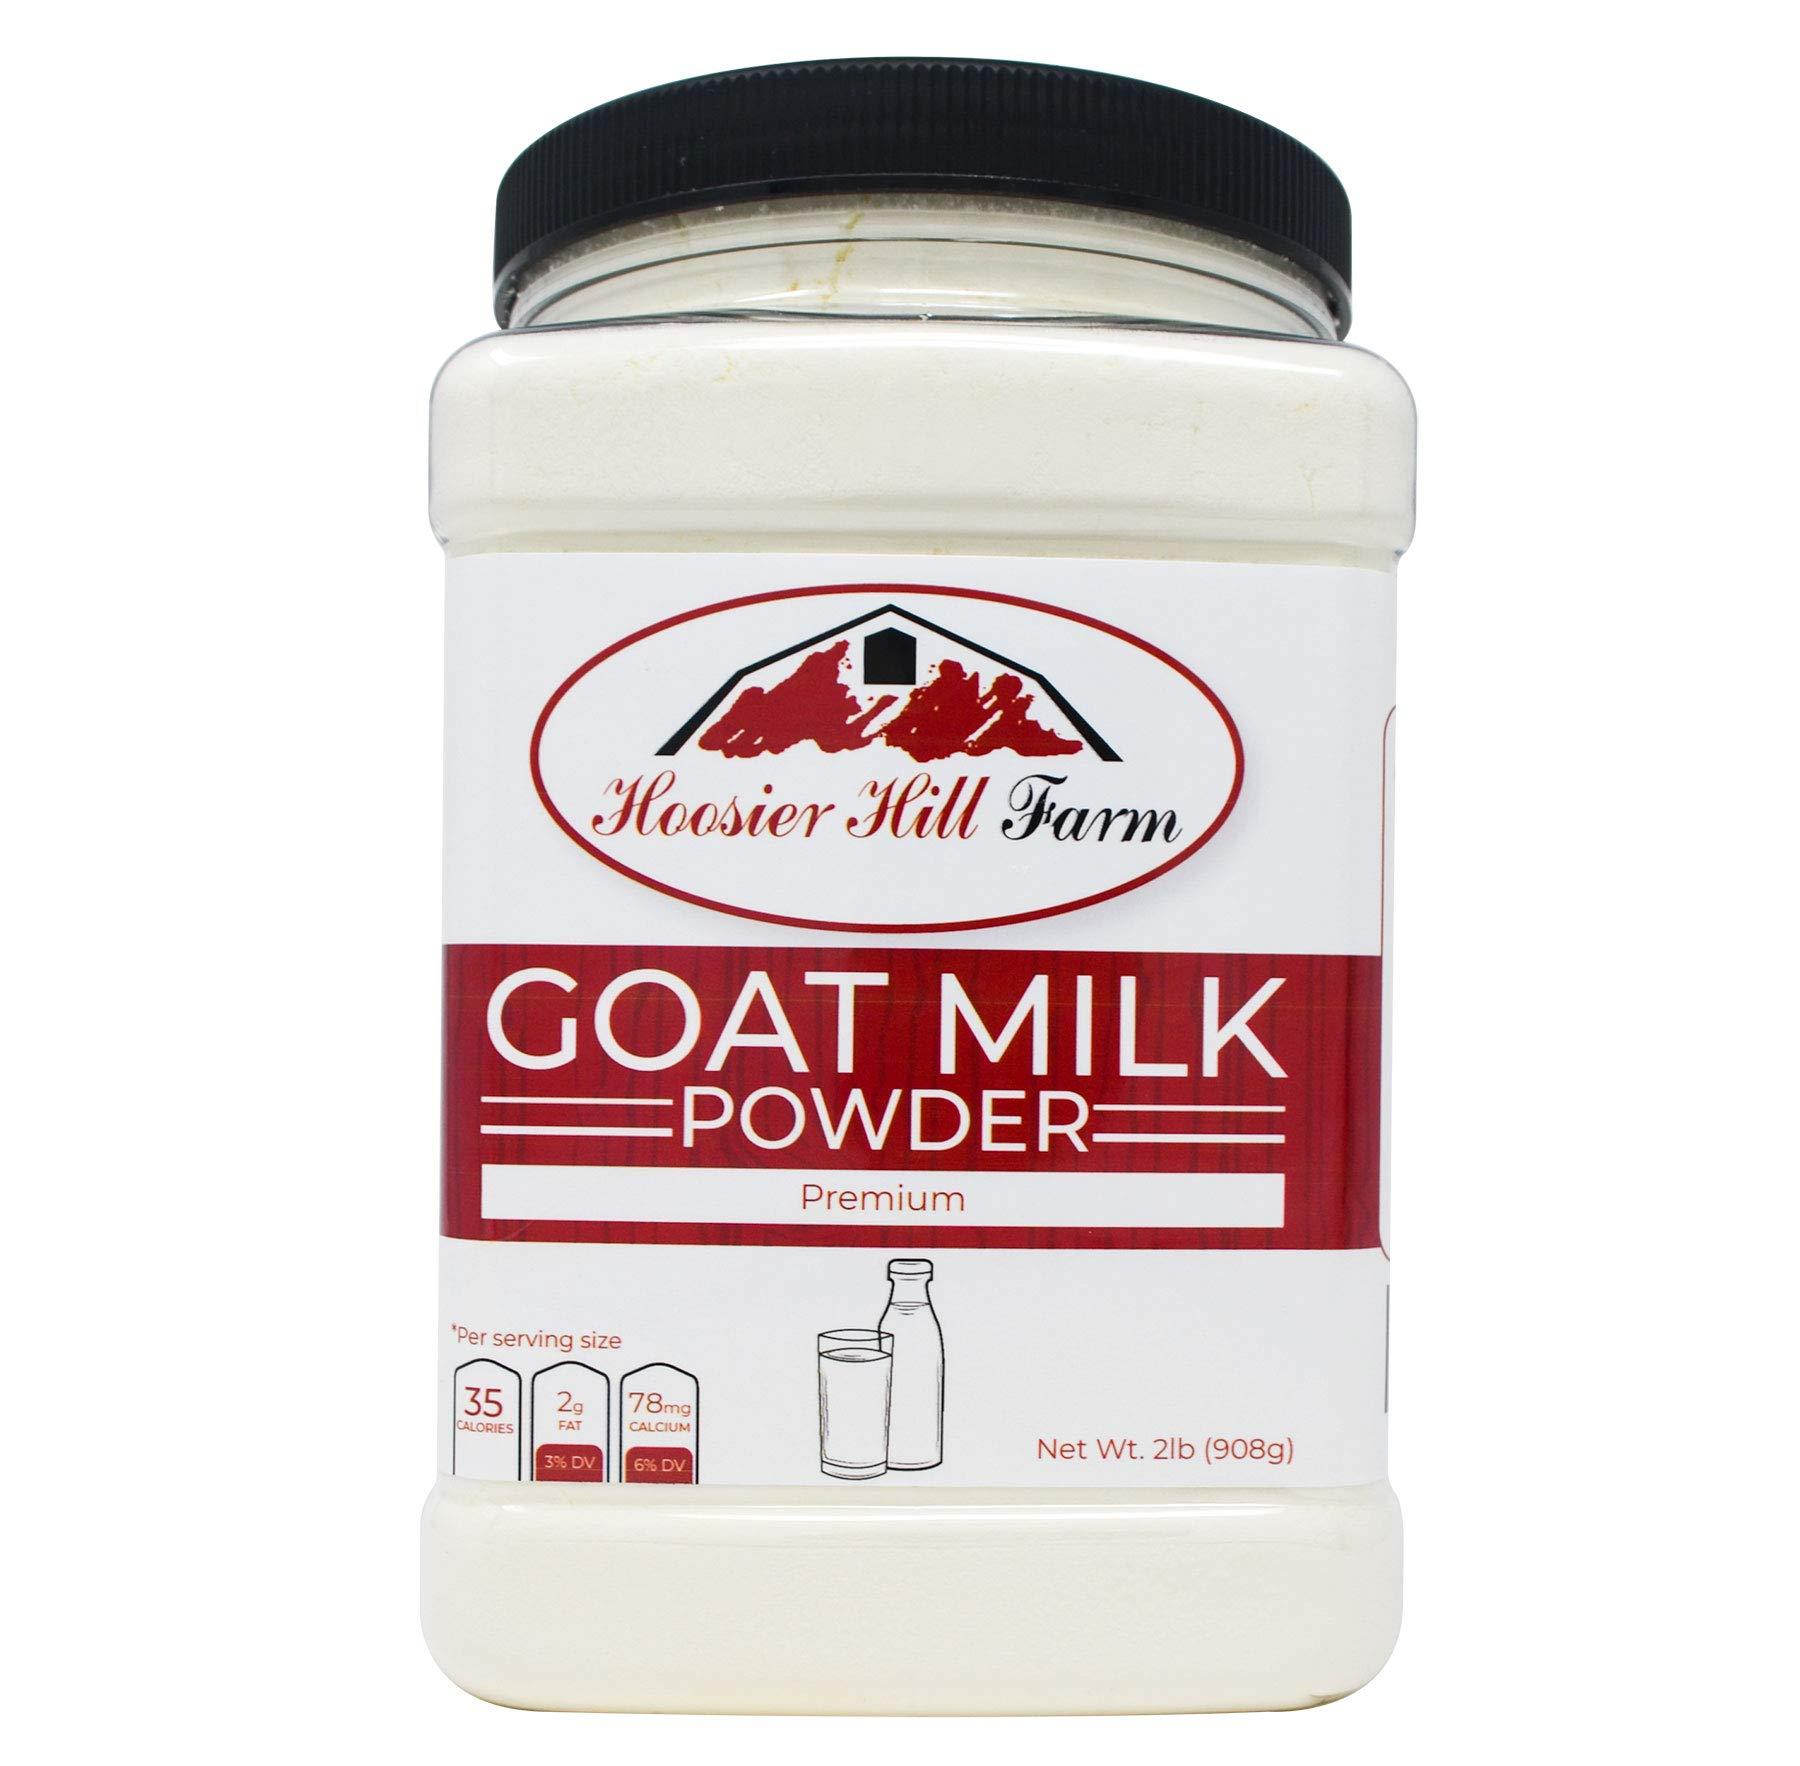 Hoosier Hill Farm Goat Milk Powder 2 lb. Jar, 100% Pure No Additives, Hormone and Antibiotic Free, Batch tested Gluten Free, and Non-GMO by Hoosier Hill Farm